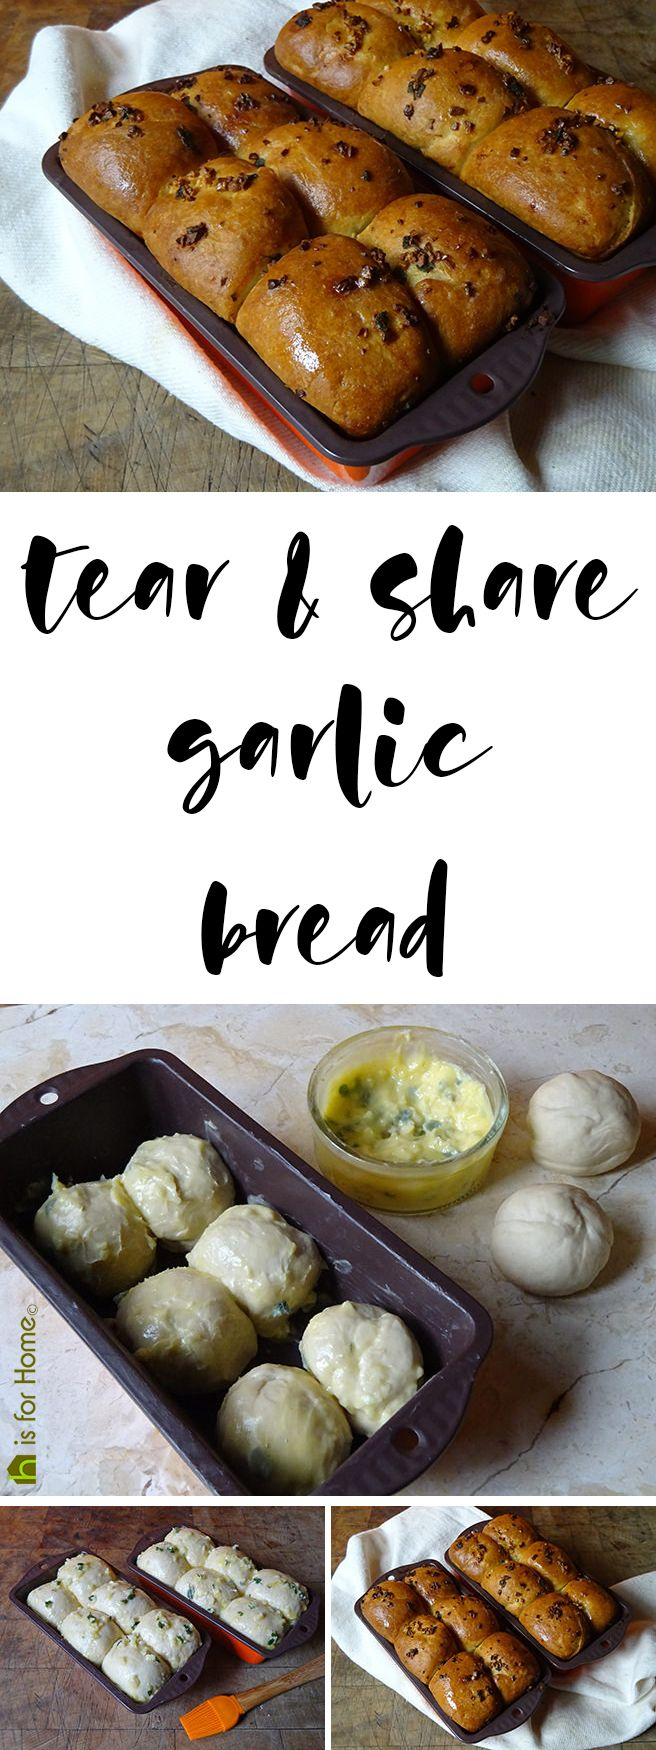 Home-made tear & share garlic bread  #recipe #bread #realbread #garlic #garlicbread #baking #cooking #cookery